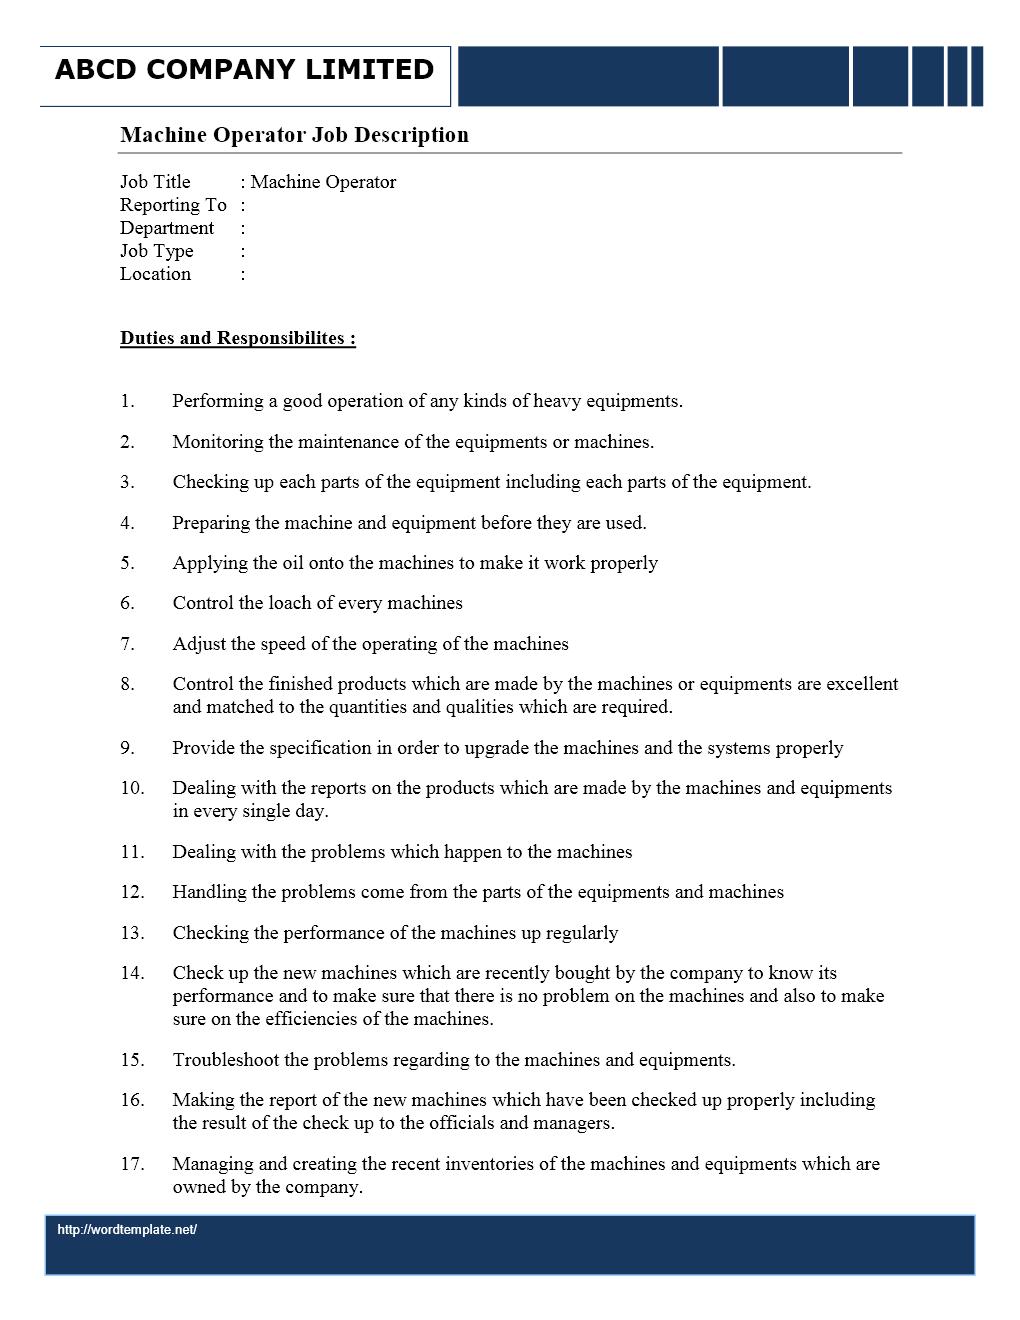 machine operator job description